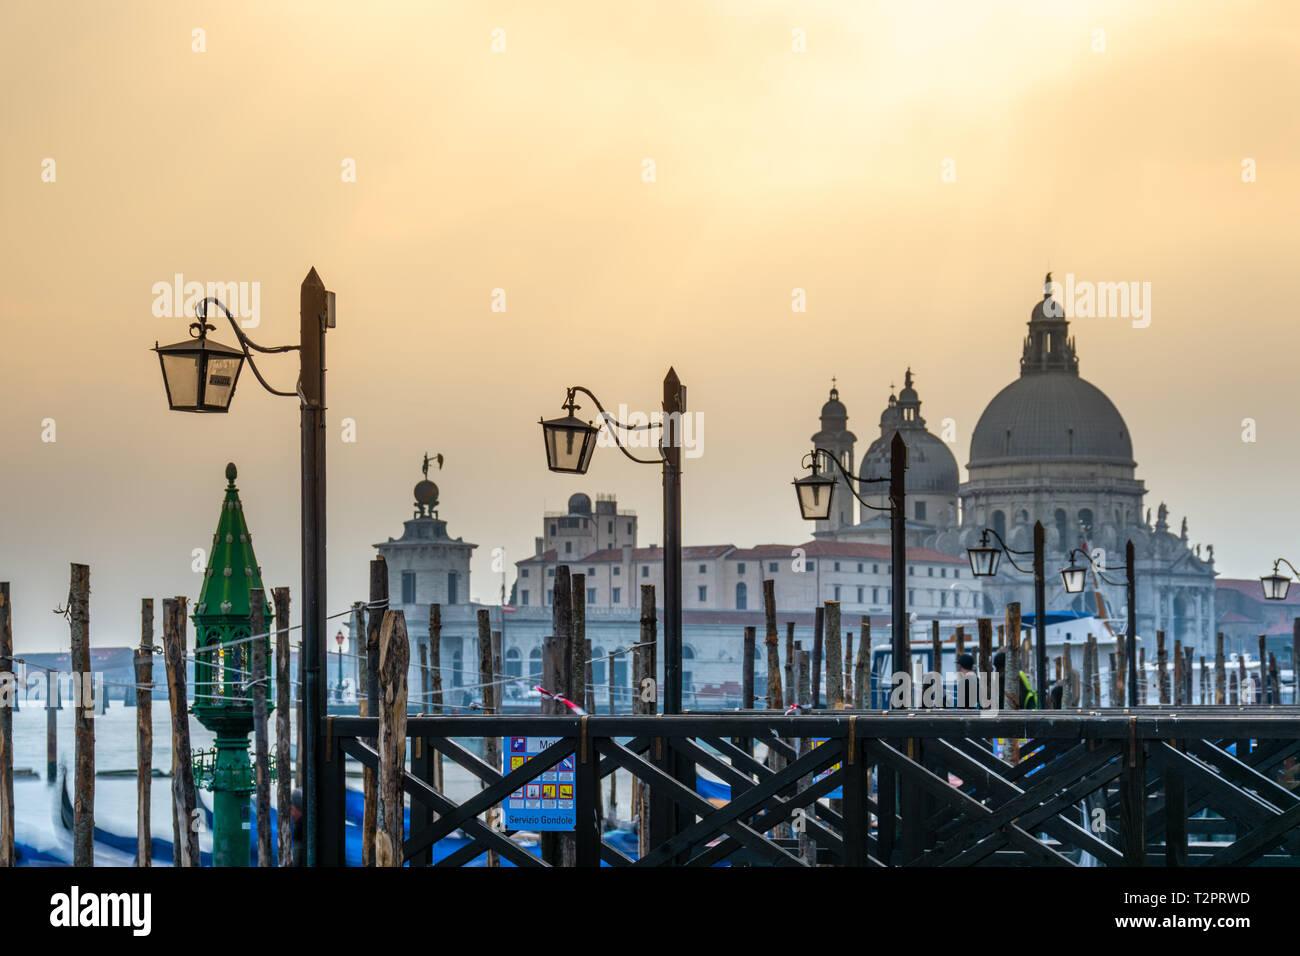 Old cathedral of Santa Maria della Salute in Venice, Italy Stock Photo